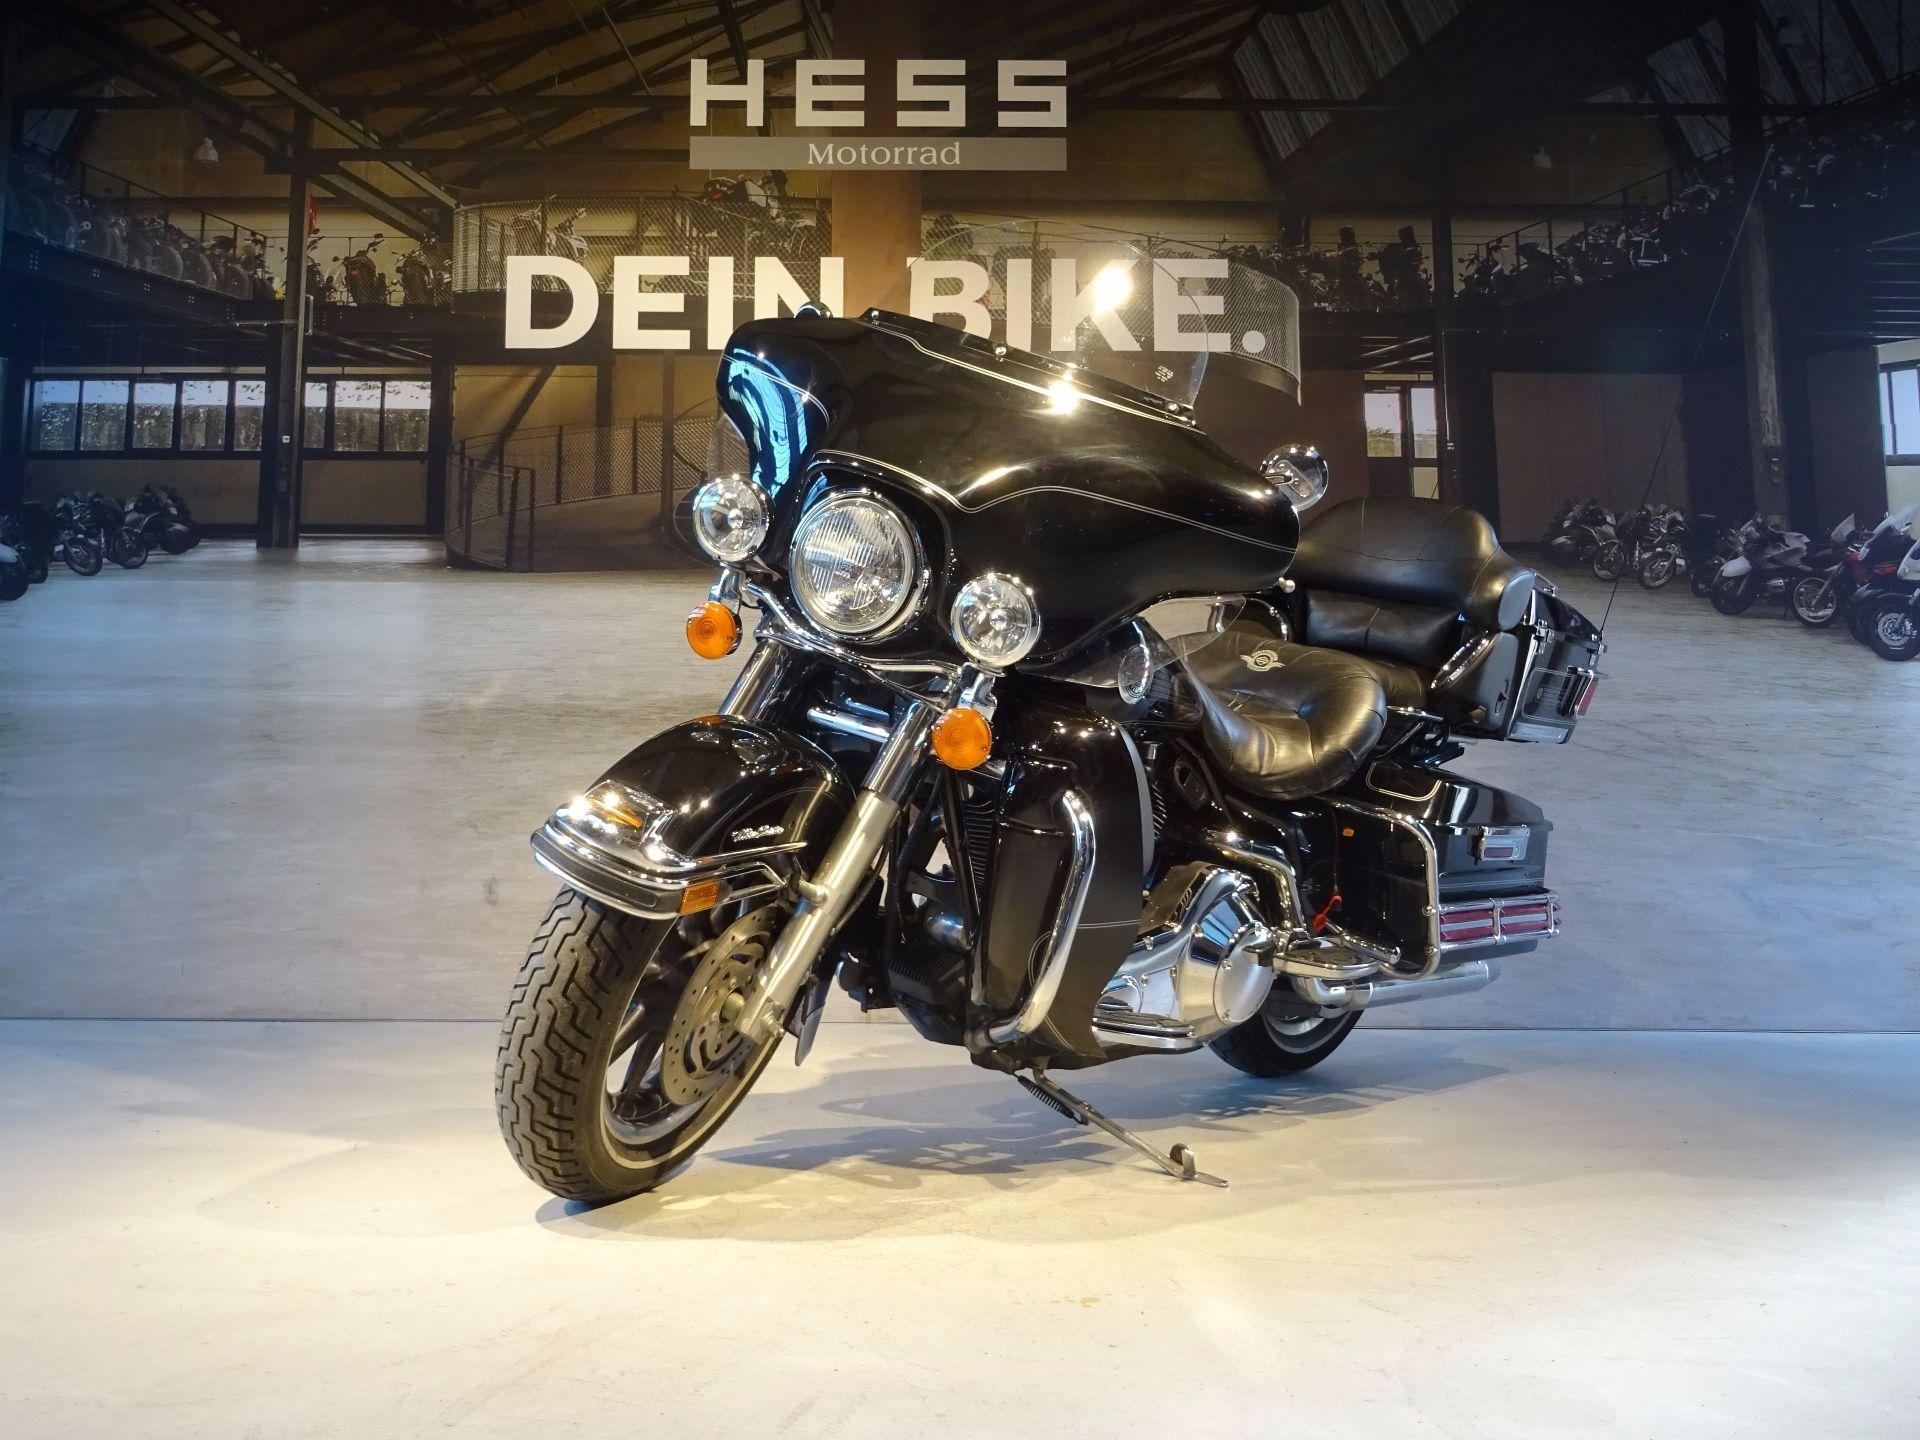 motorrad occasion kaufen harley davidson flhtcui 1450 electra glide ultra classic hess motorrad. Black Bedroom Furniture Sets. Home Design Ideas